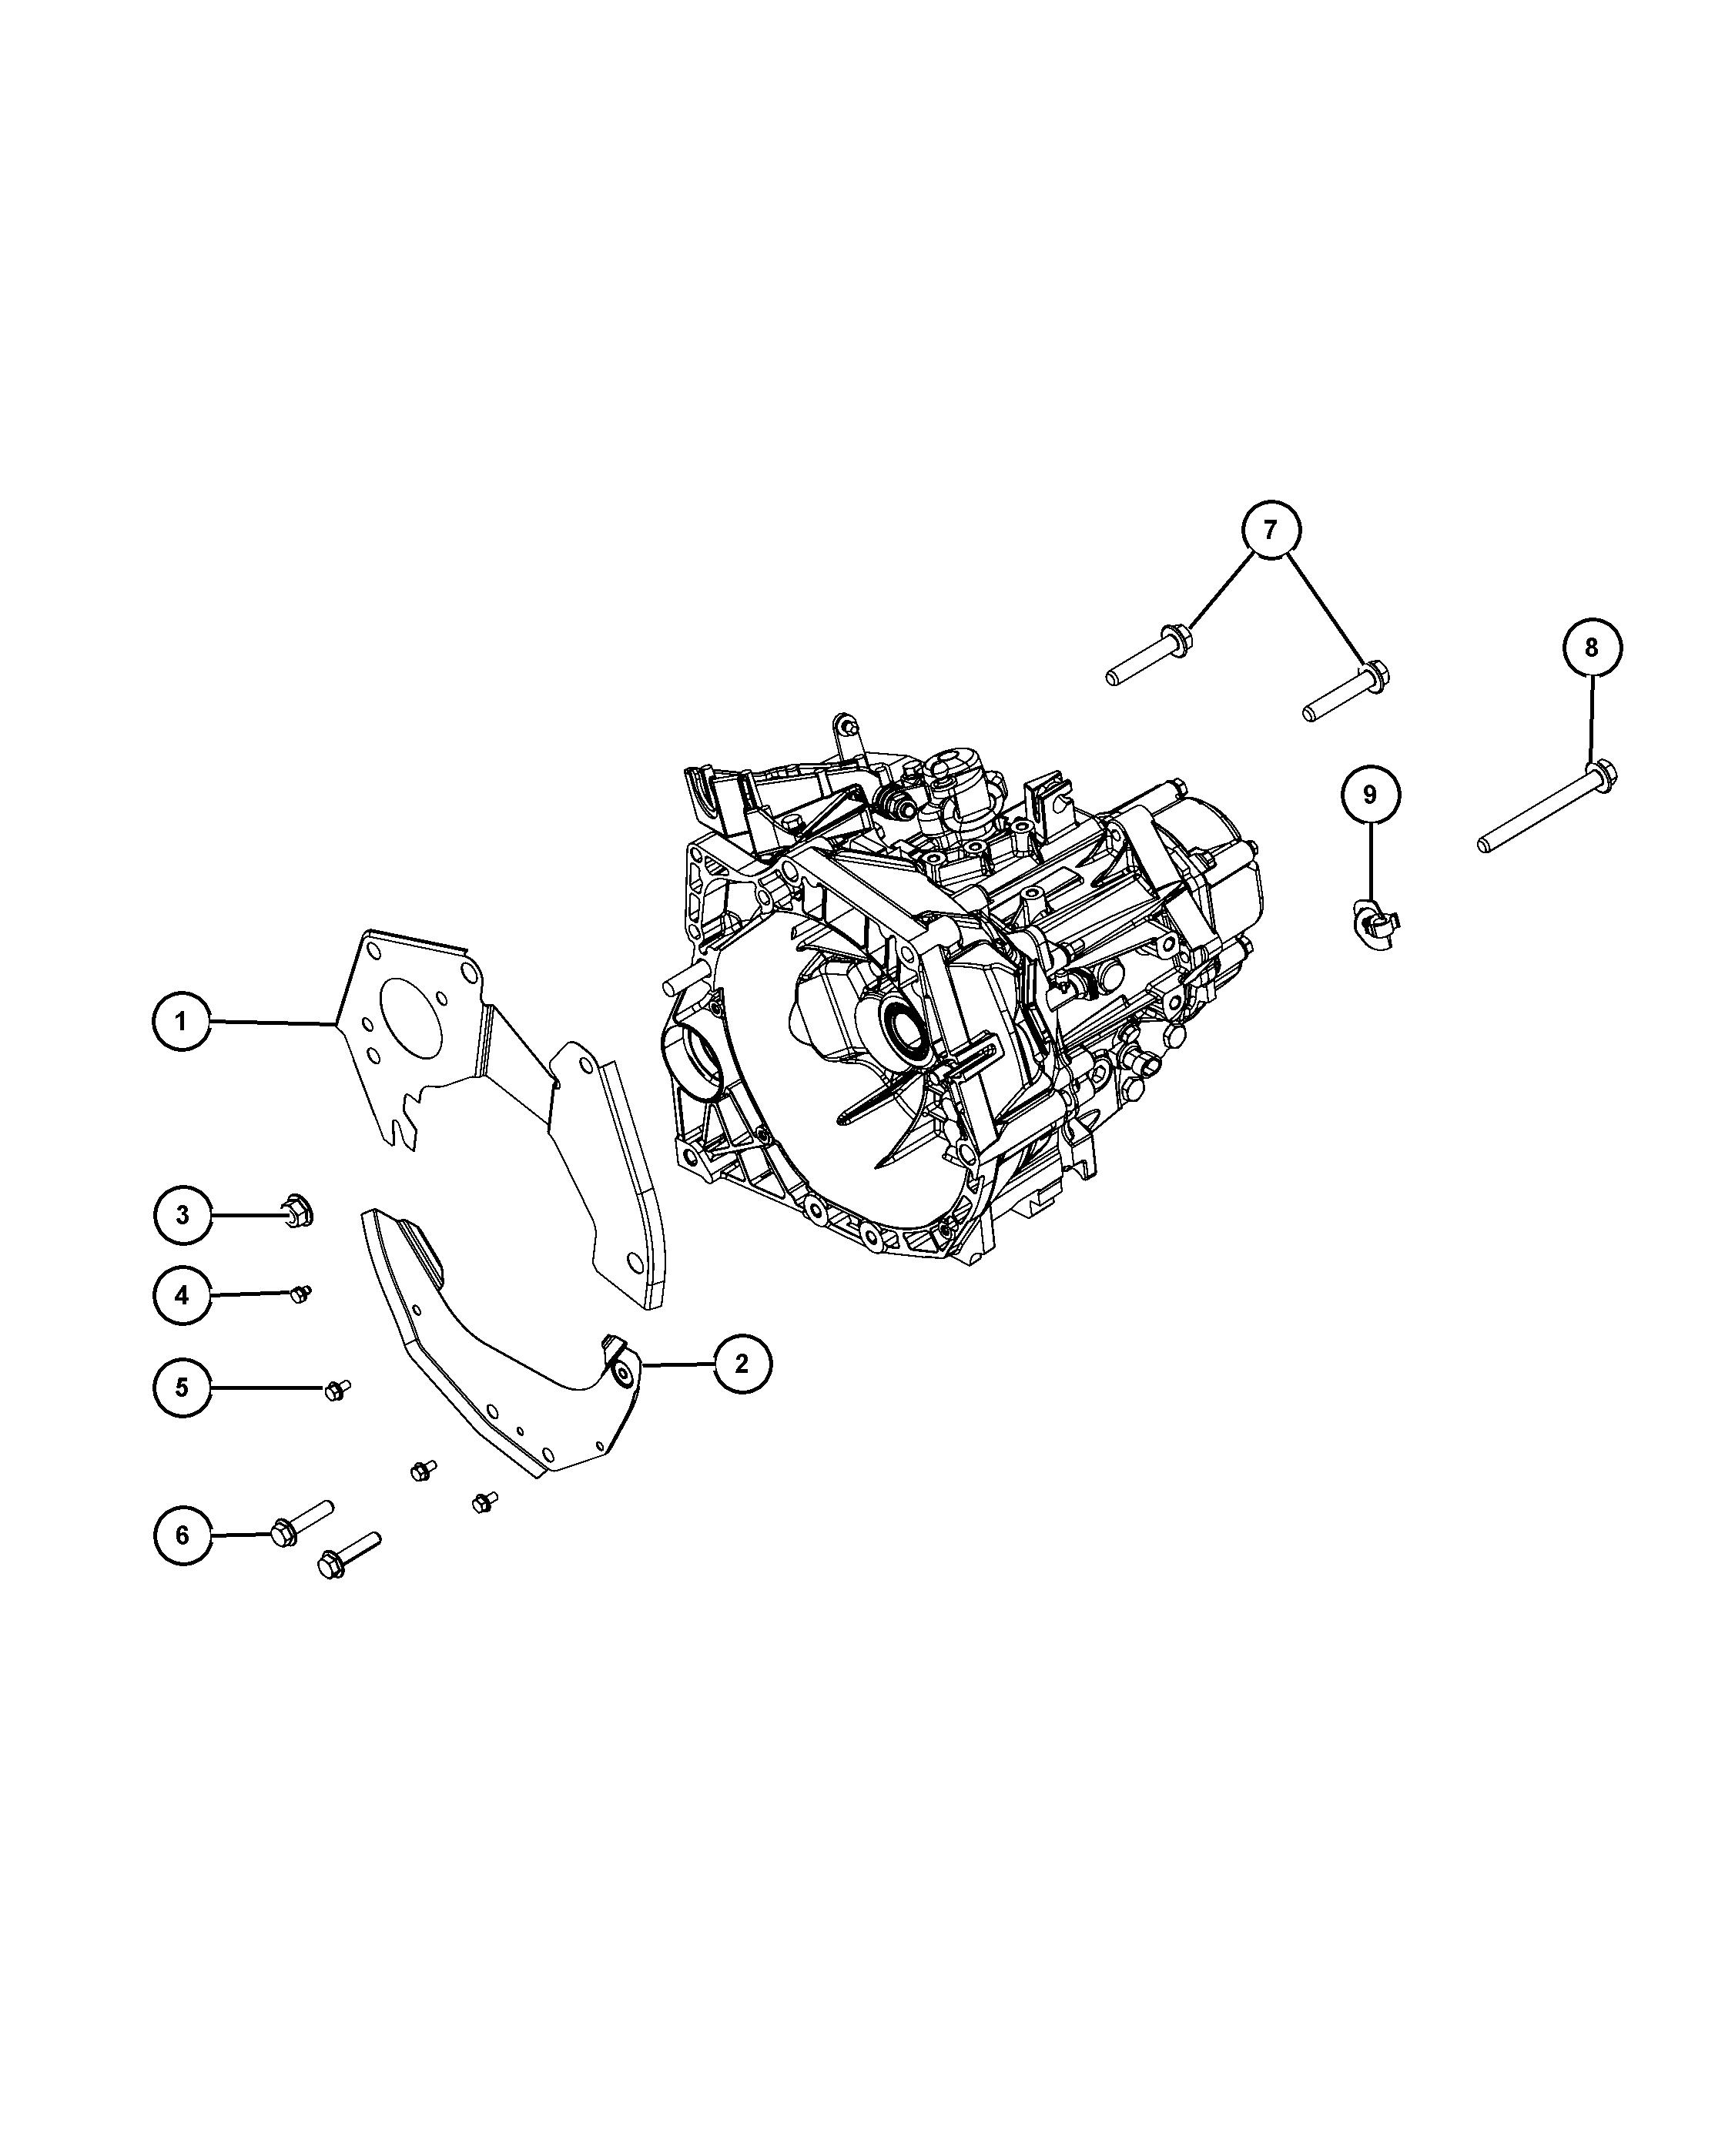 Chrysler 2017 Ff Fiat 500 21dde C510 5 Speed Manual Transaxle 126 Alternator Wiring Diagram